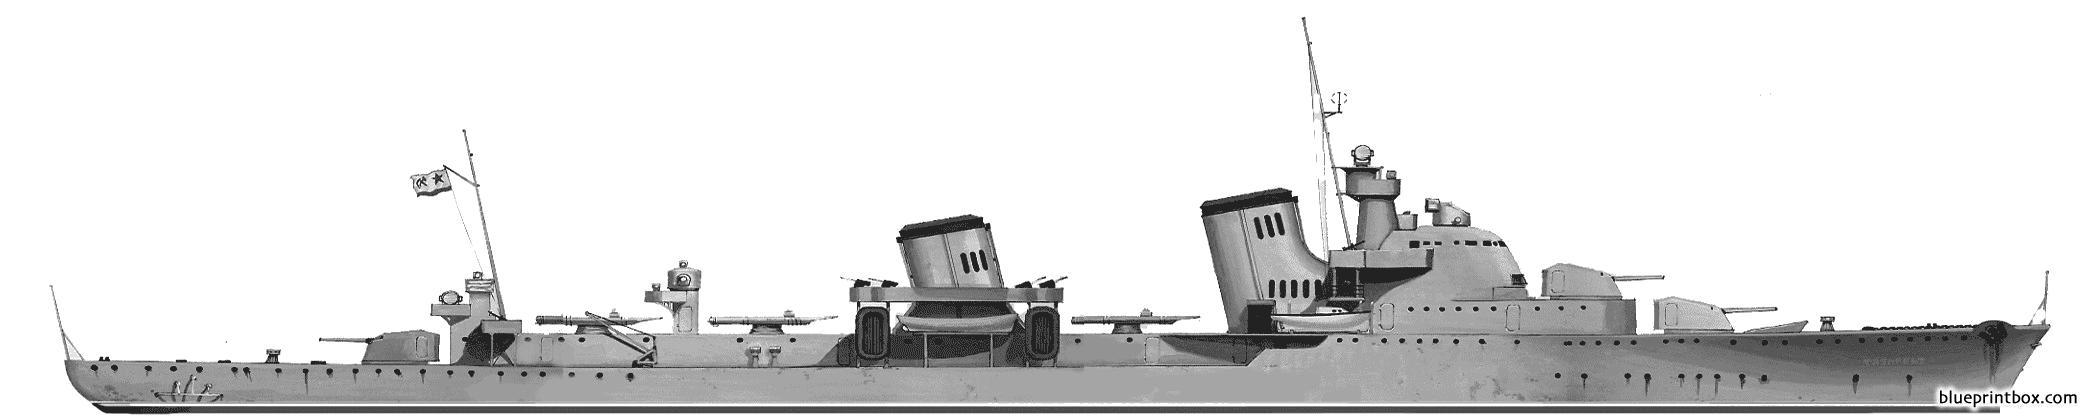 Ussr Tashkent 1939 Destroyer - Blueprintbox Com